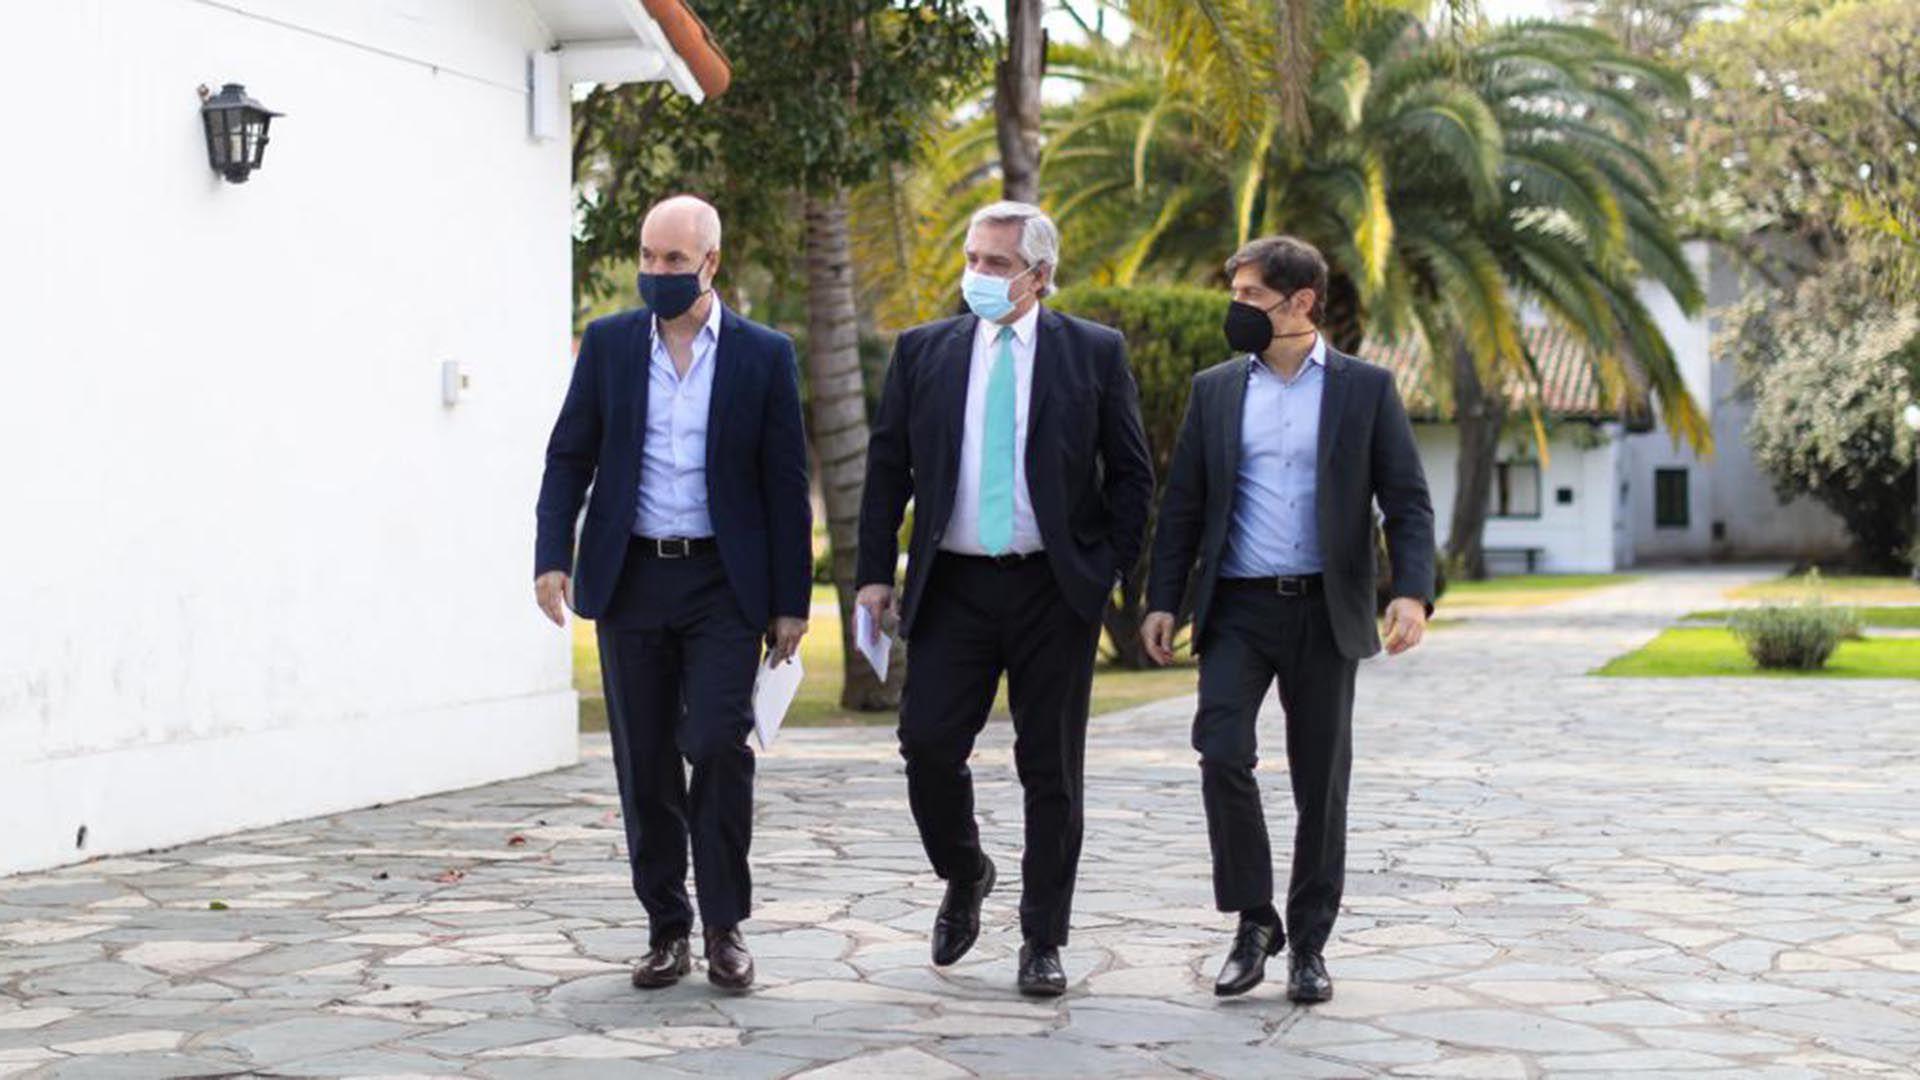 Alberto Fernandez Horacio Rodriguez Larreta Axel Kicillof